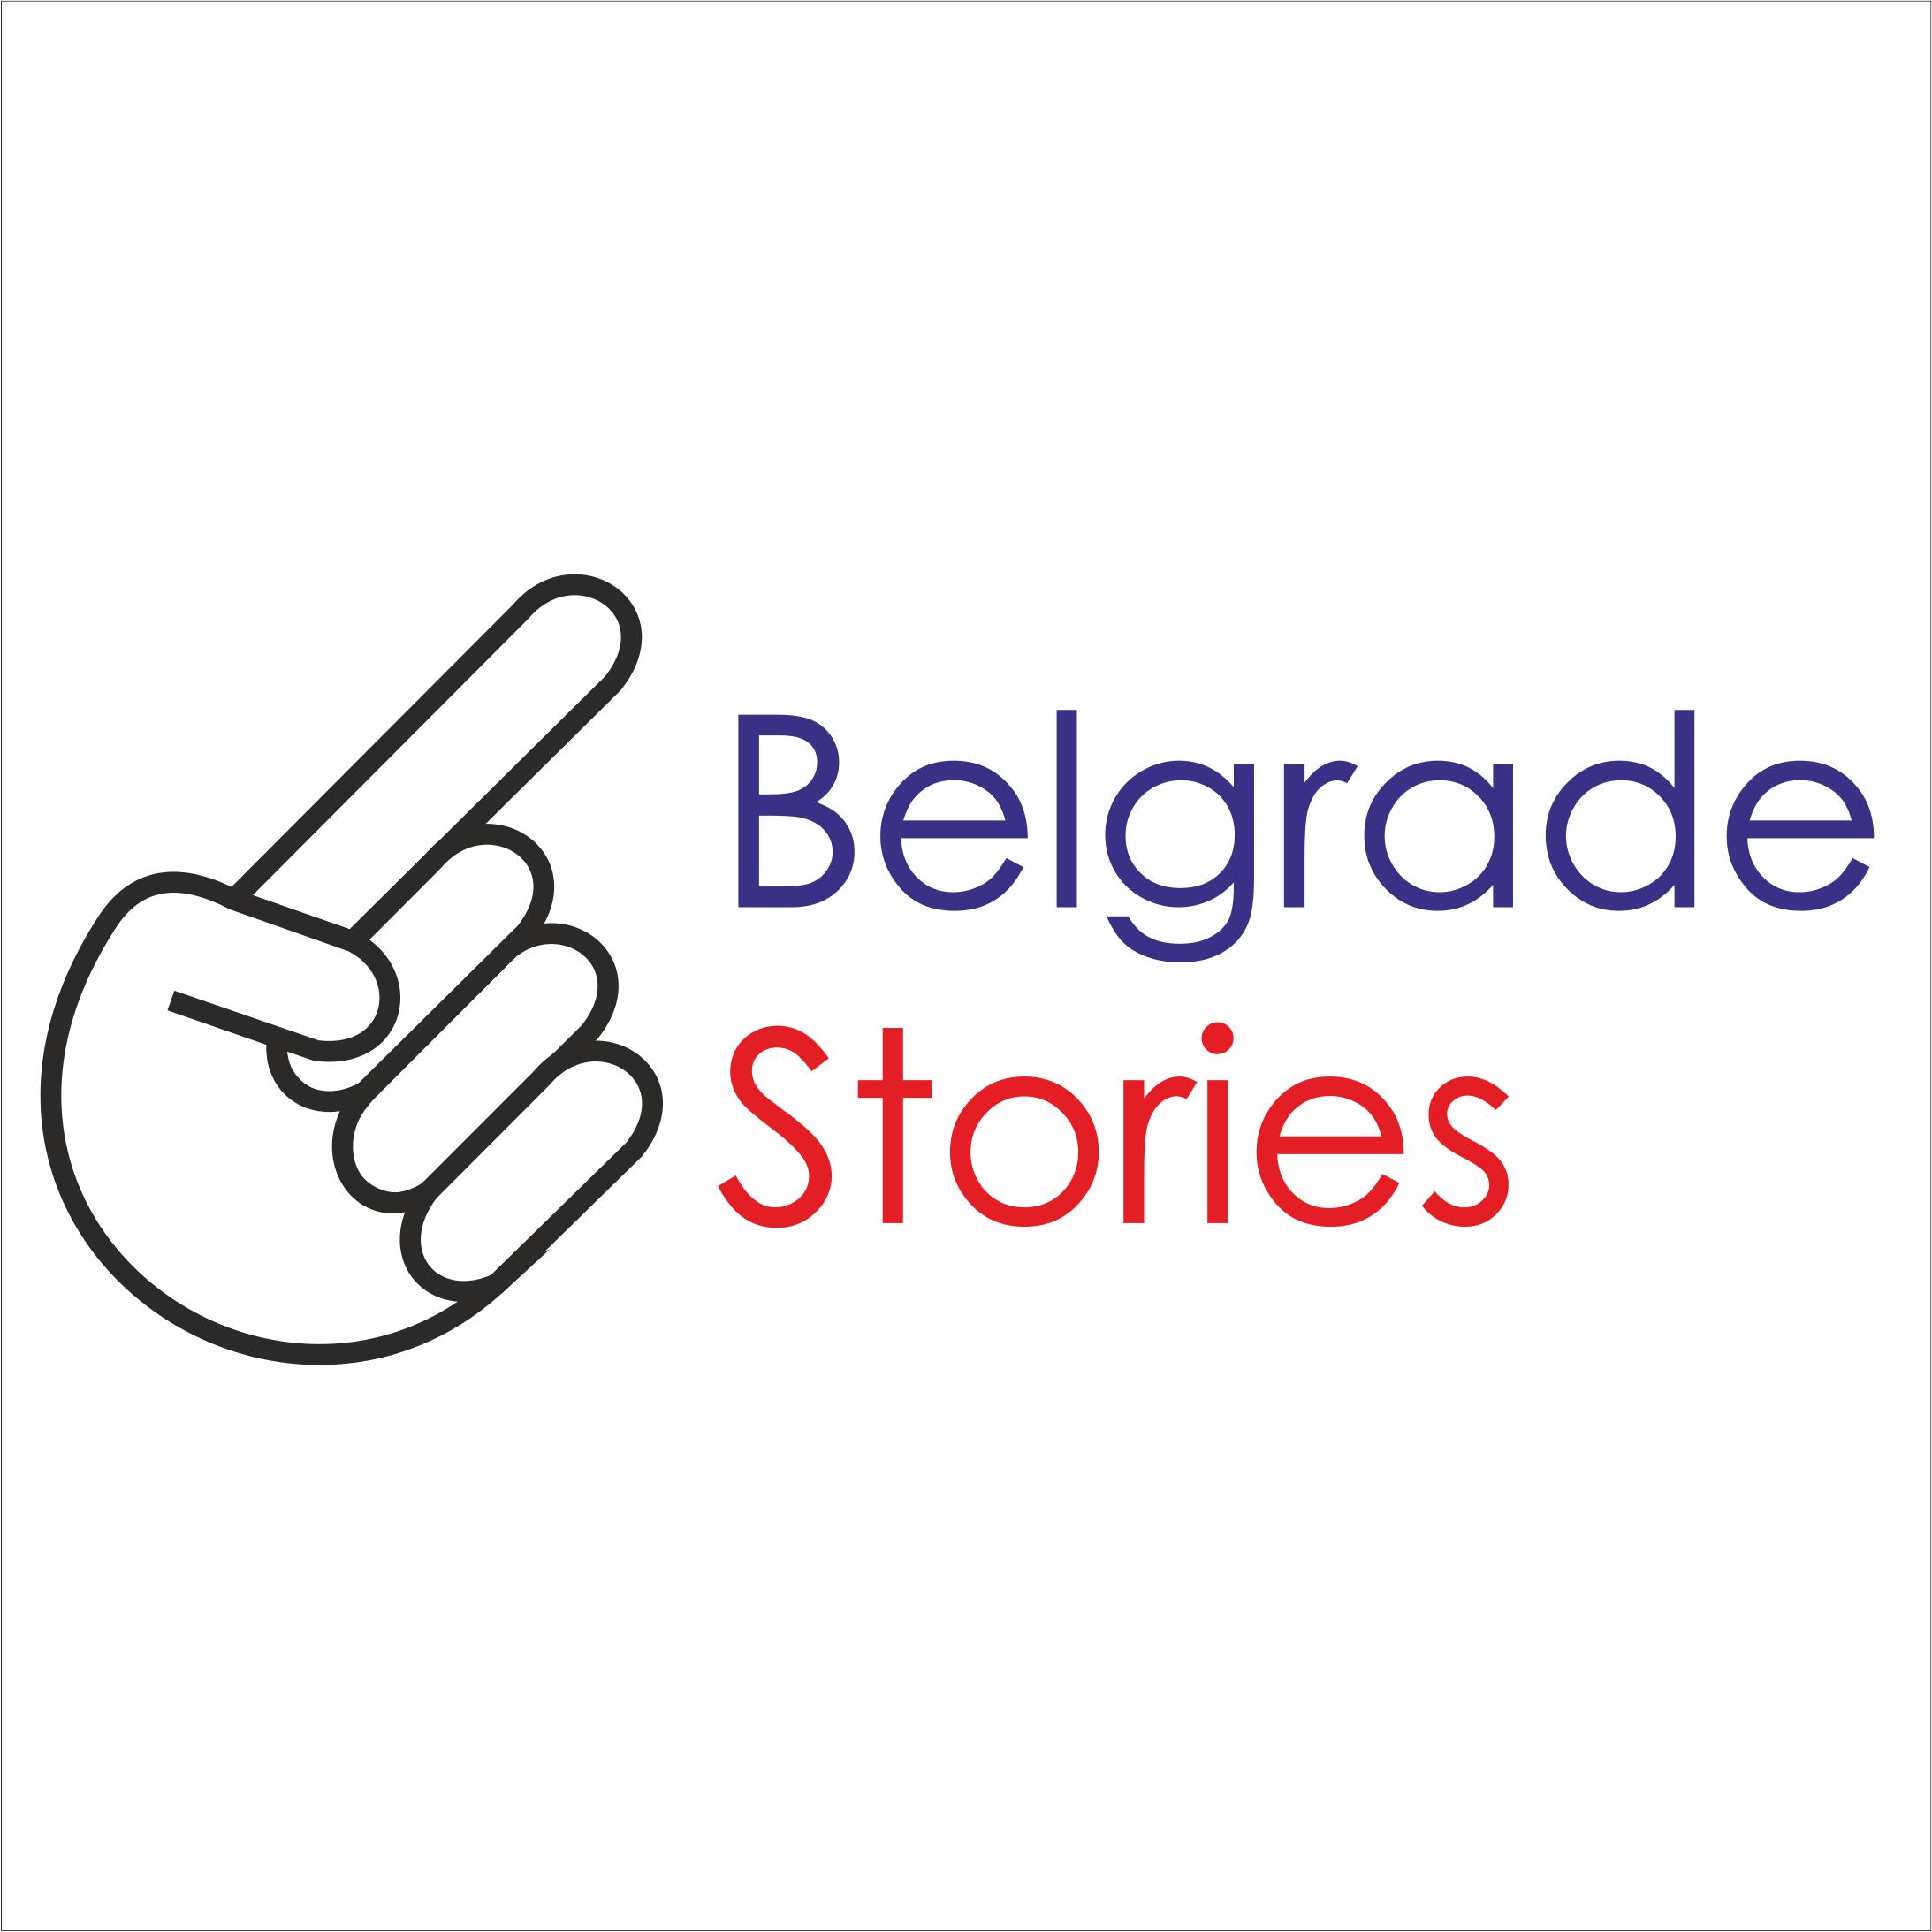 Логотип для агентства городских туров в Белграде фото f_3015895ba0b43ba2.jpg